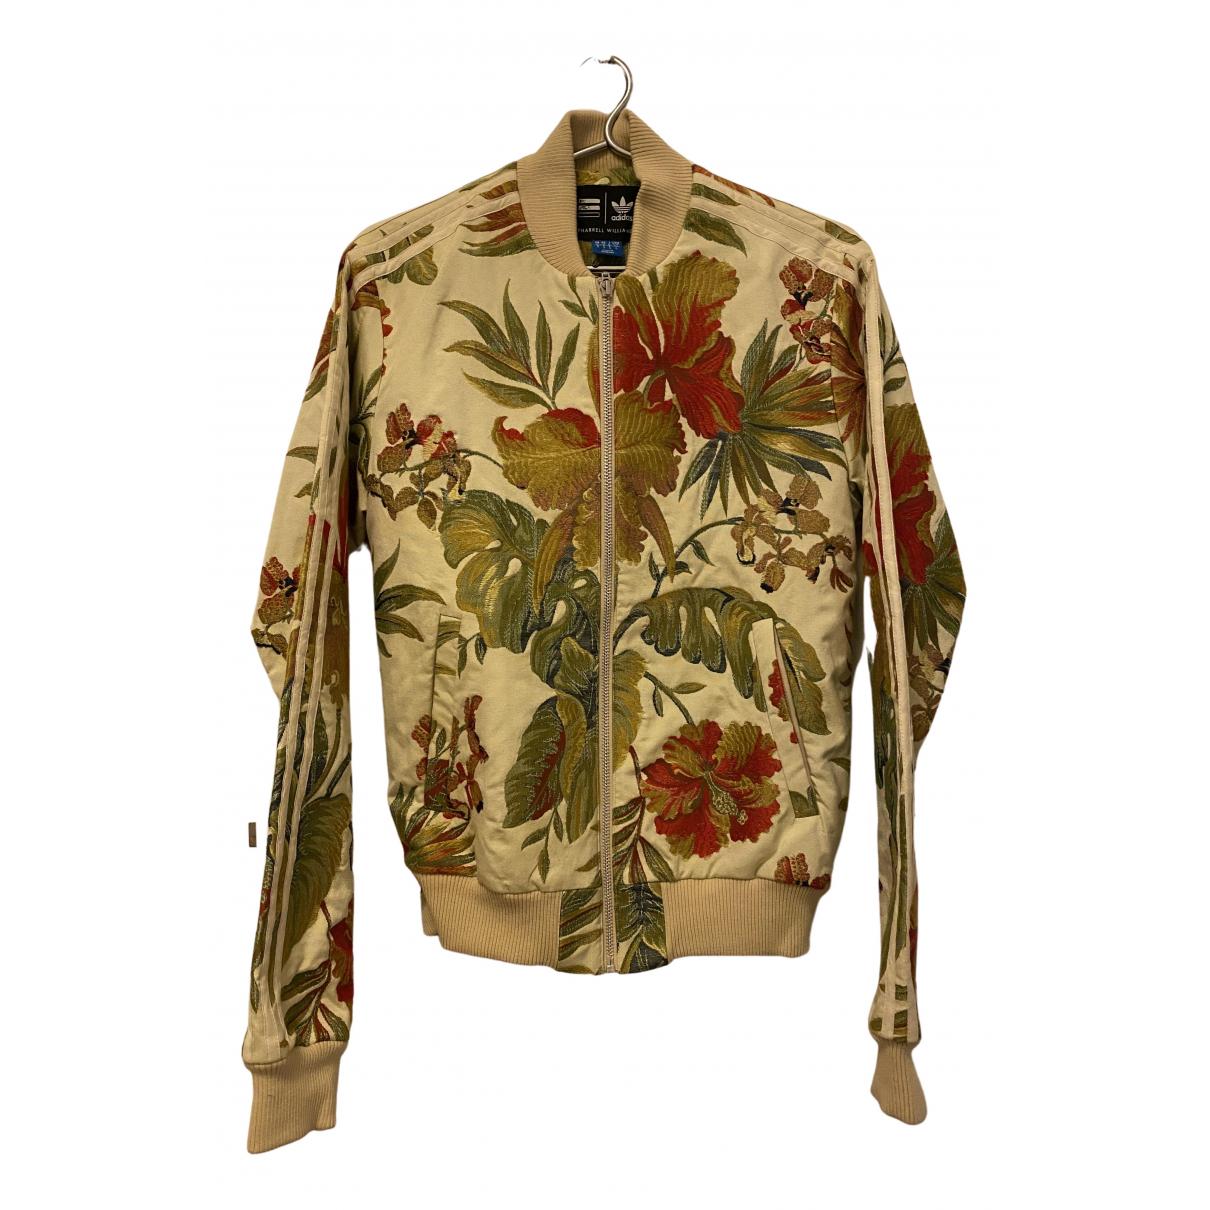 Adidas X Pharrell Williams \N Beige Cotton jacket  for Men S International